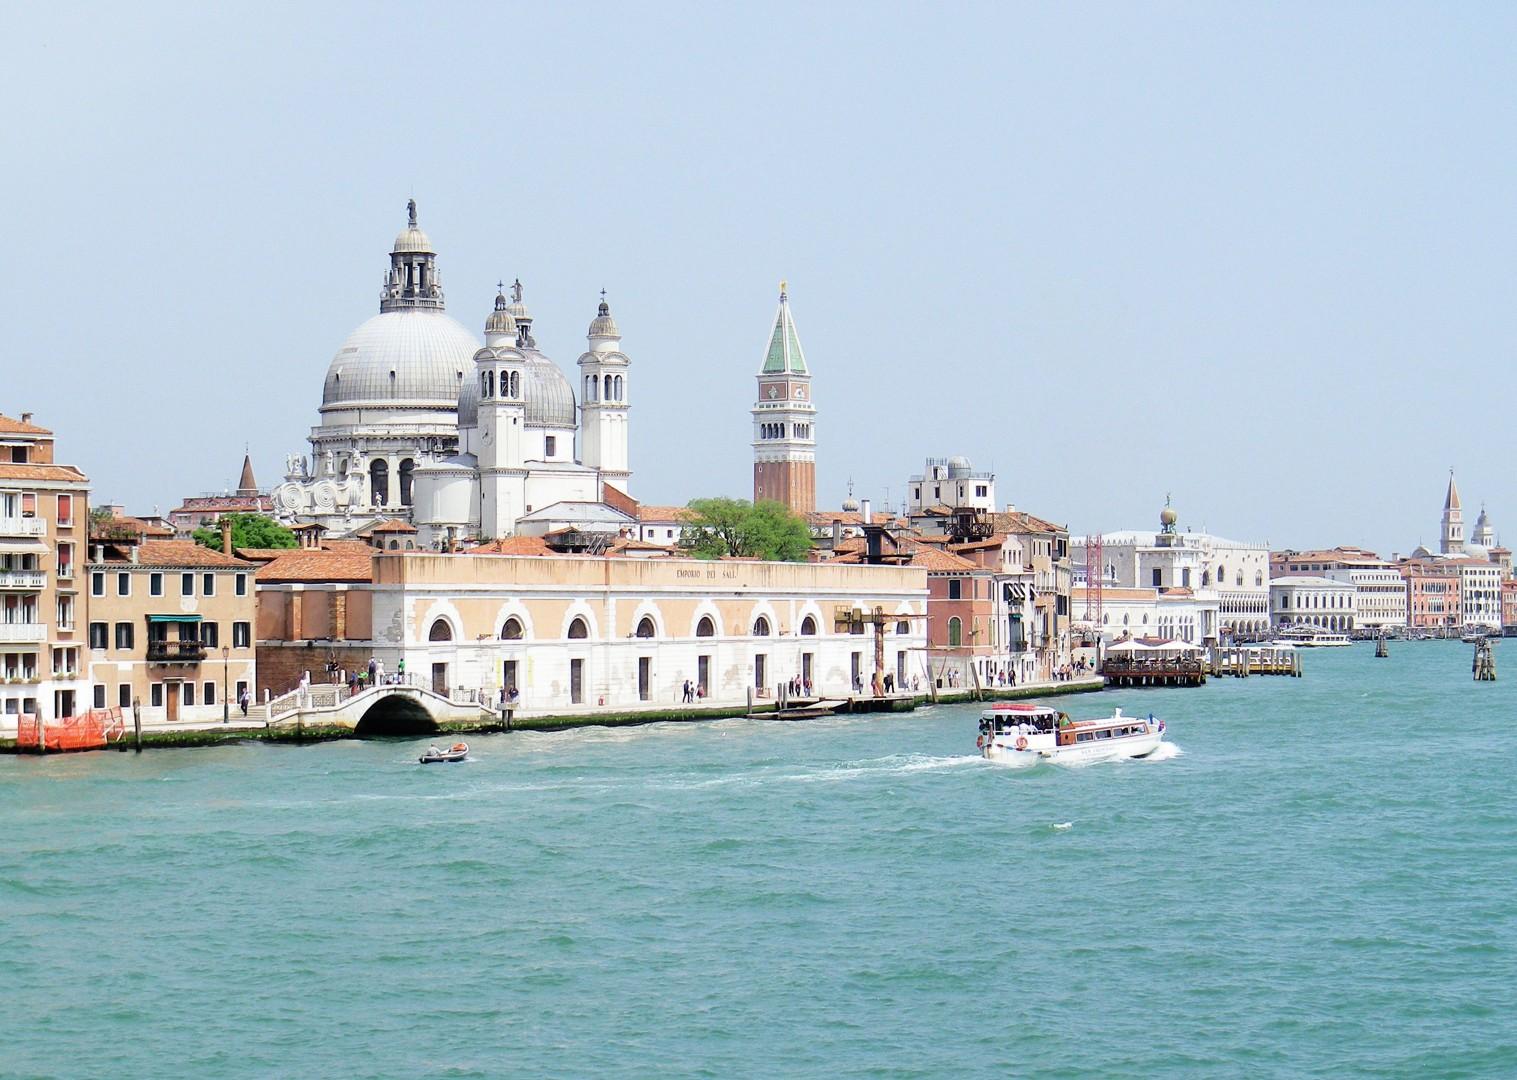 Family-Cycling-Holiday-Lake-Garda-Venice-Italy-Pallestrina-Island.jpg - Italy - Lake Garda to Venice - Self-Guided Family Cycling Holiday - Italia Leisure and Family Cycling